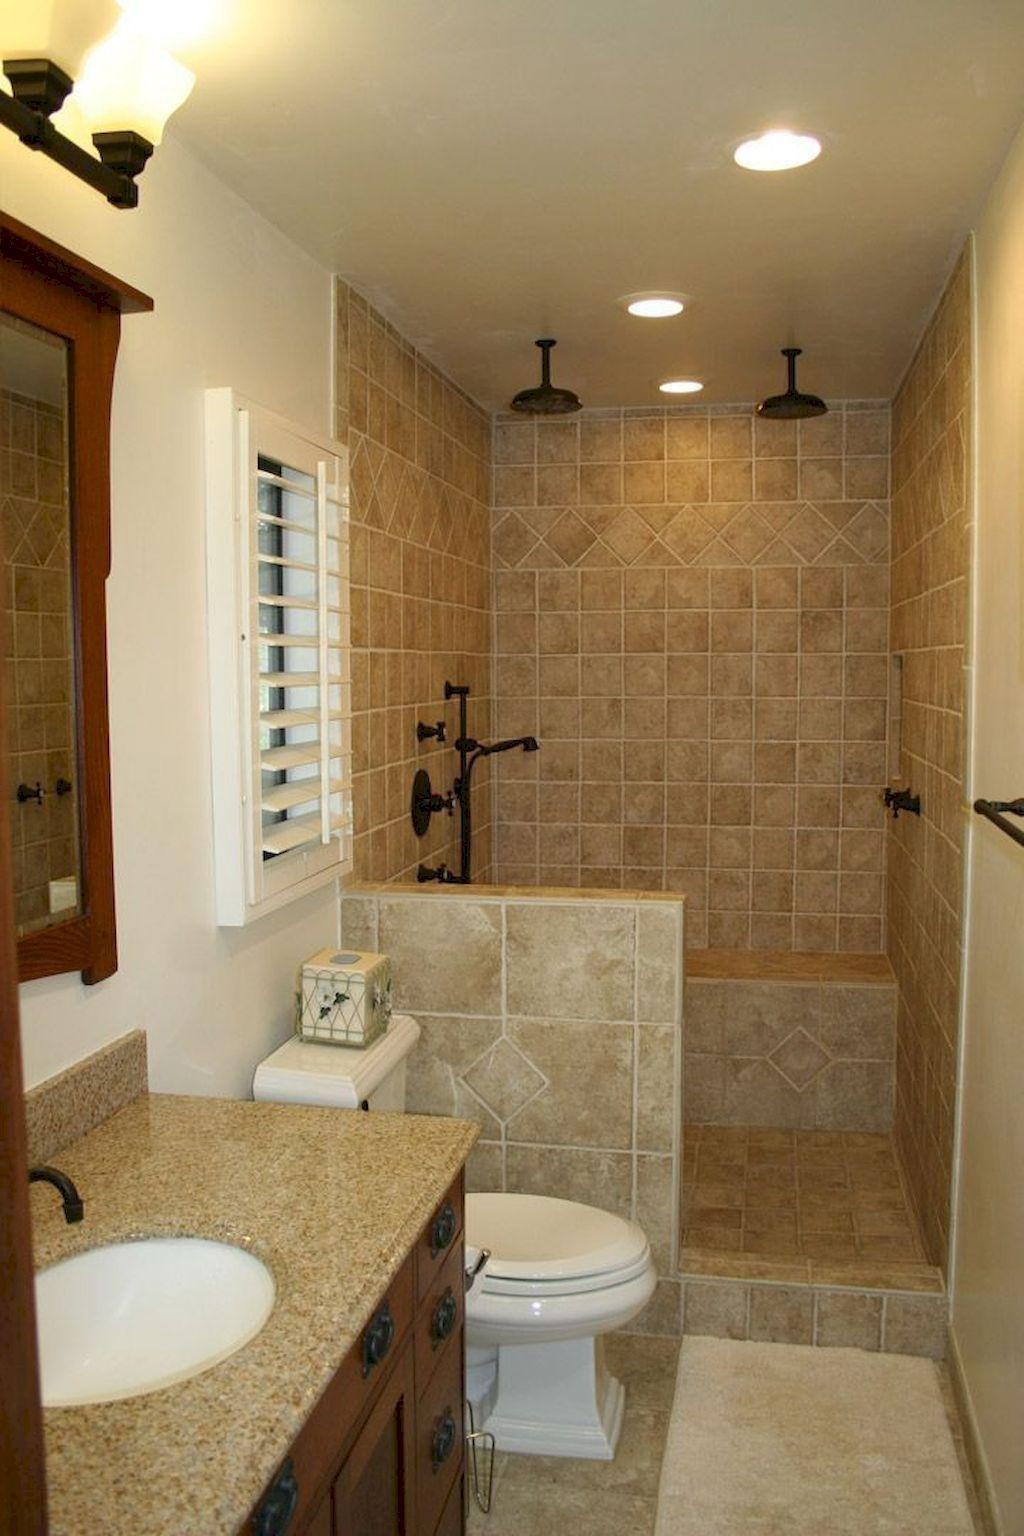 Bathroom Categories : Decor. Bathroom. Farmhouse. Design. in 2020   Small  bathroom remodel, Bathroom remodel shower, Budget bathroom remodel